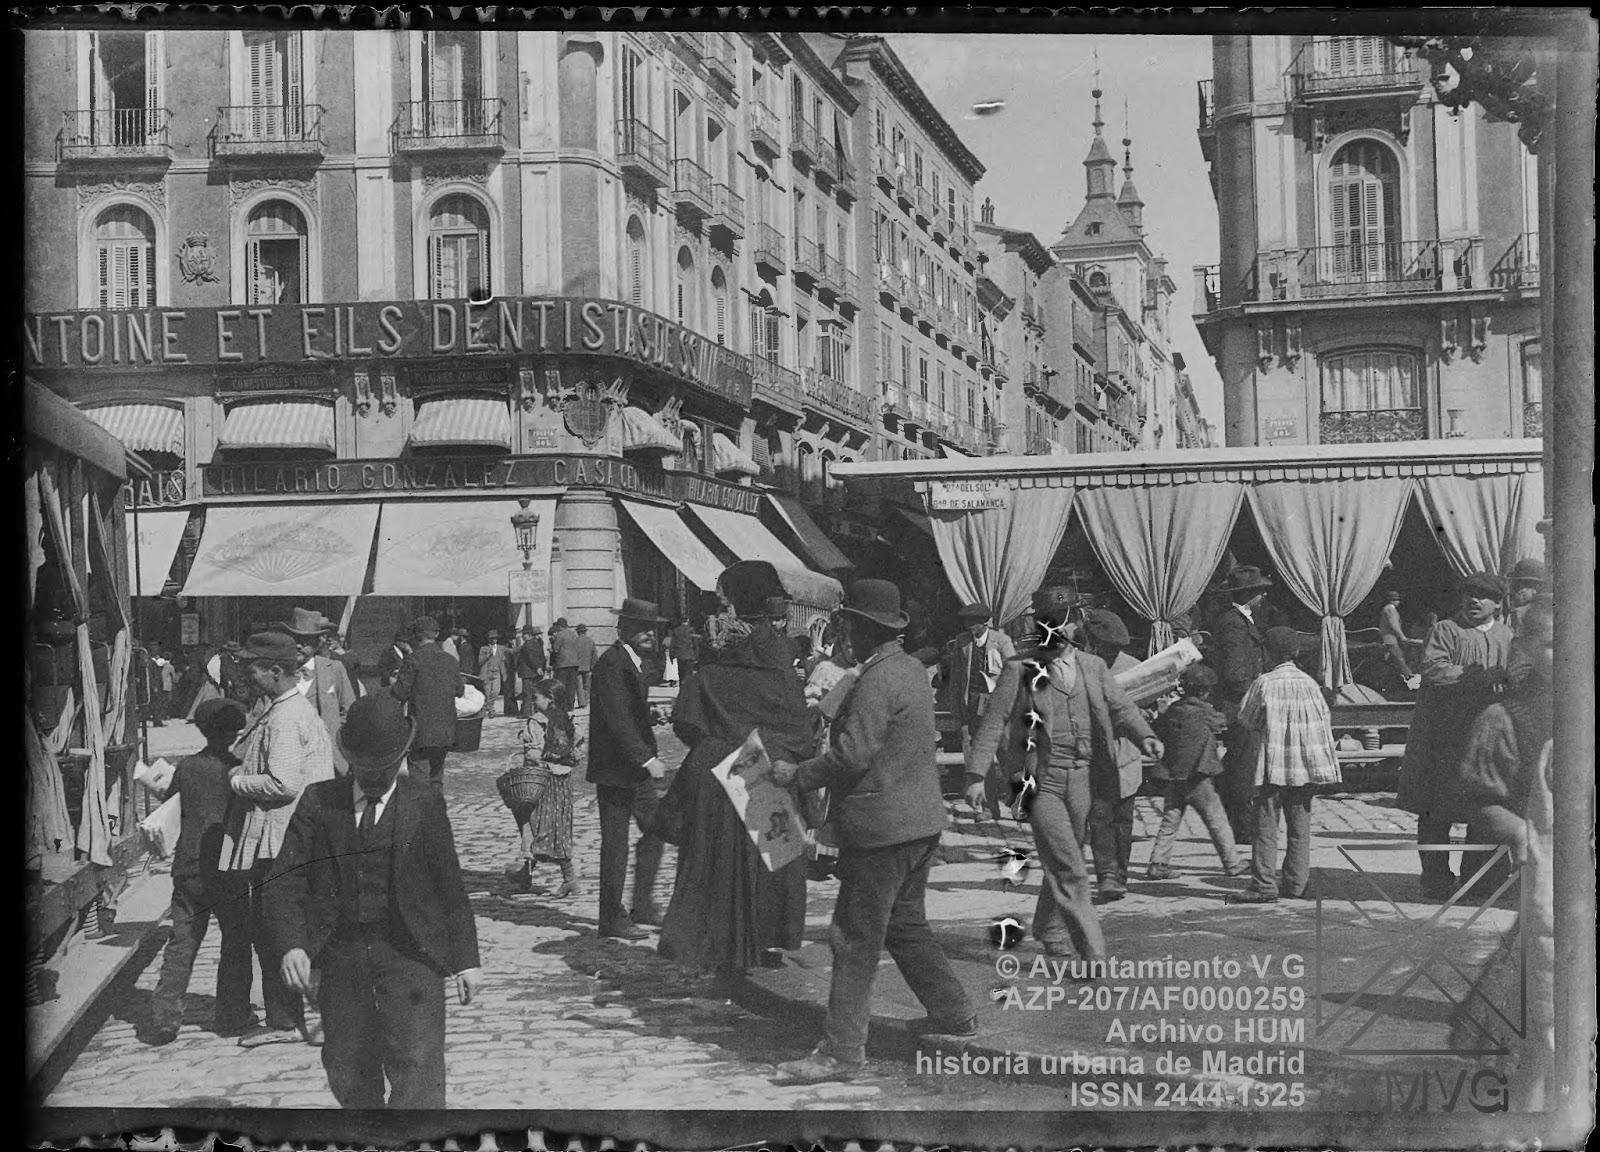 historia urbana de madrid fototeca puerta del sol y